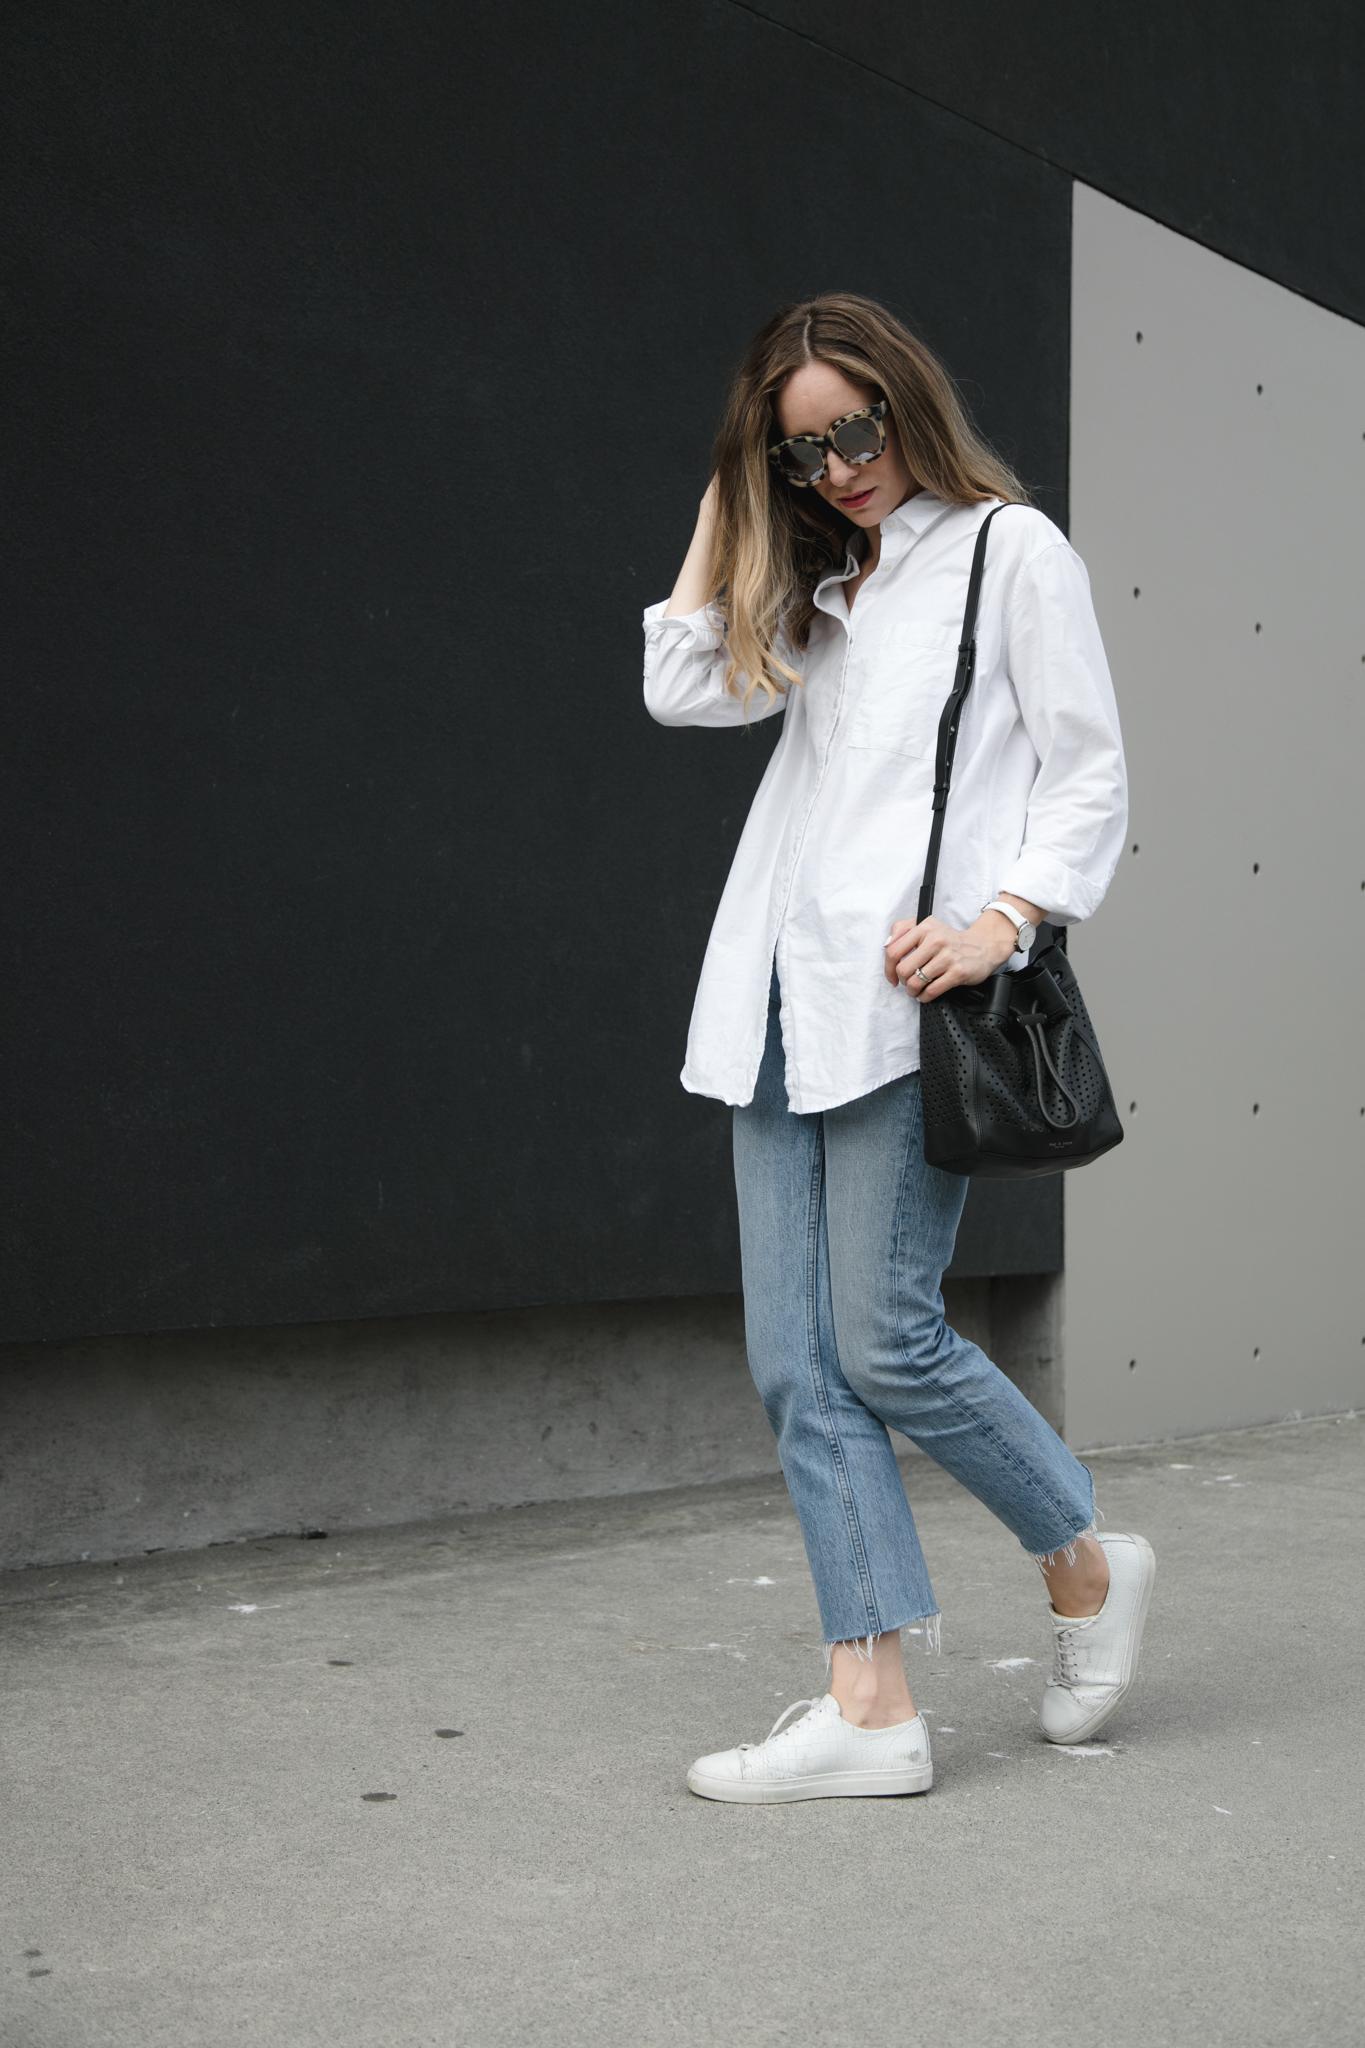 sharday-engel-frank-oak-shirt-fifth-sunglasses-helmut-lang-jeans5989.jpg